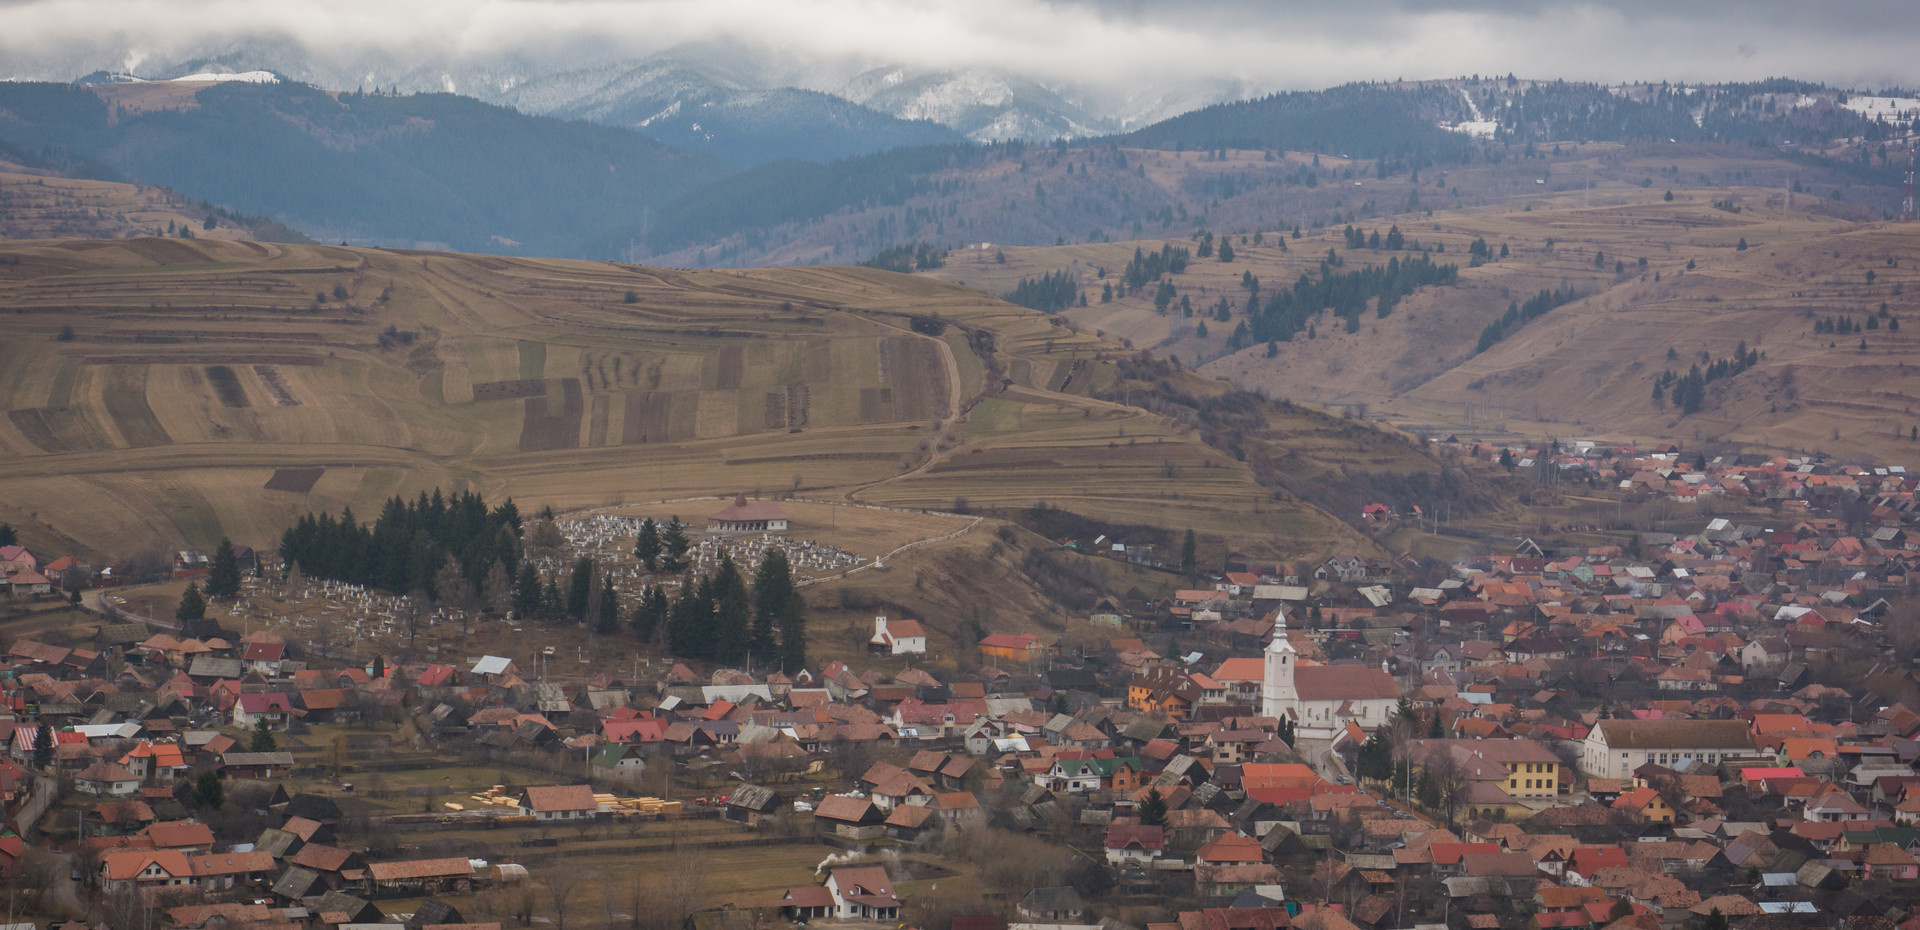 Csíkszentdomokos / Sândominic Harghita county / Hargita megye / Județul Harghita Romania / Románia / România / 2017